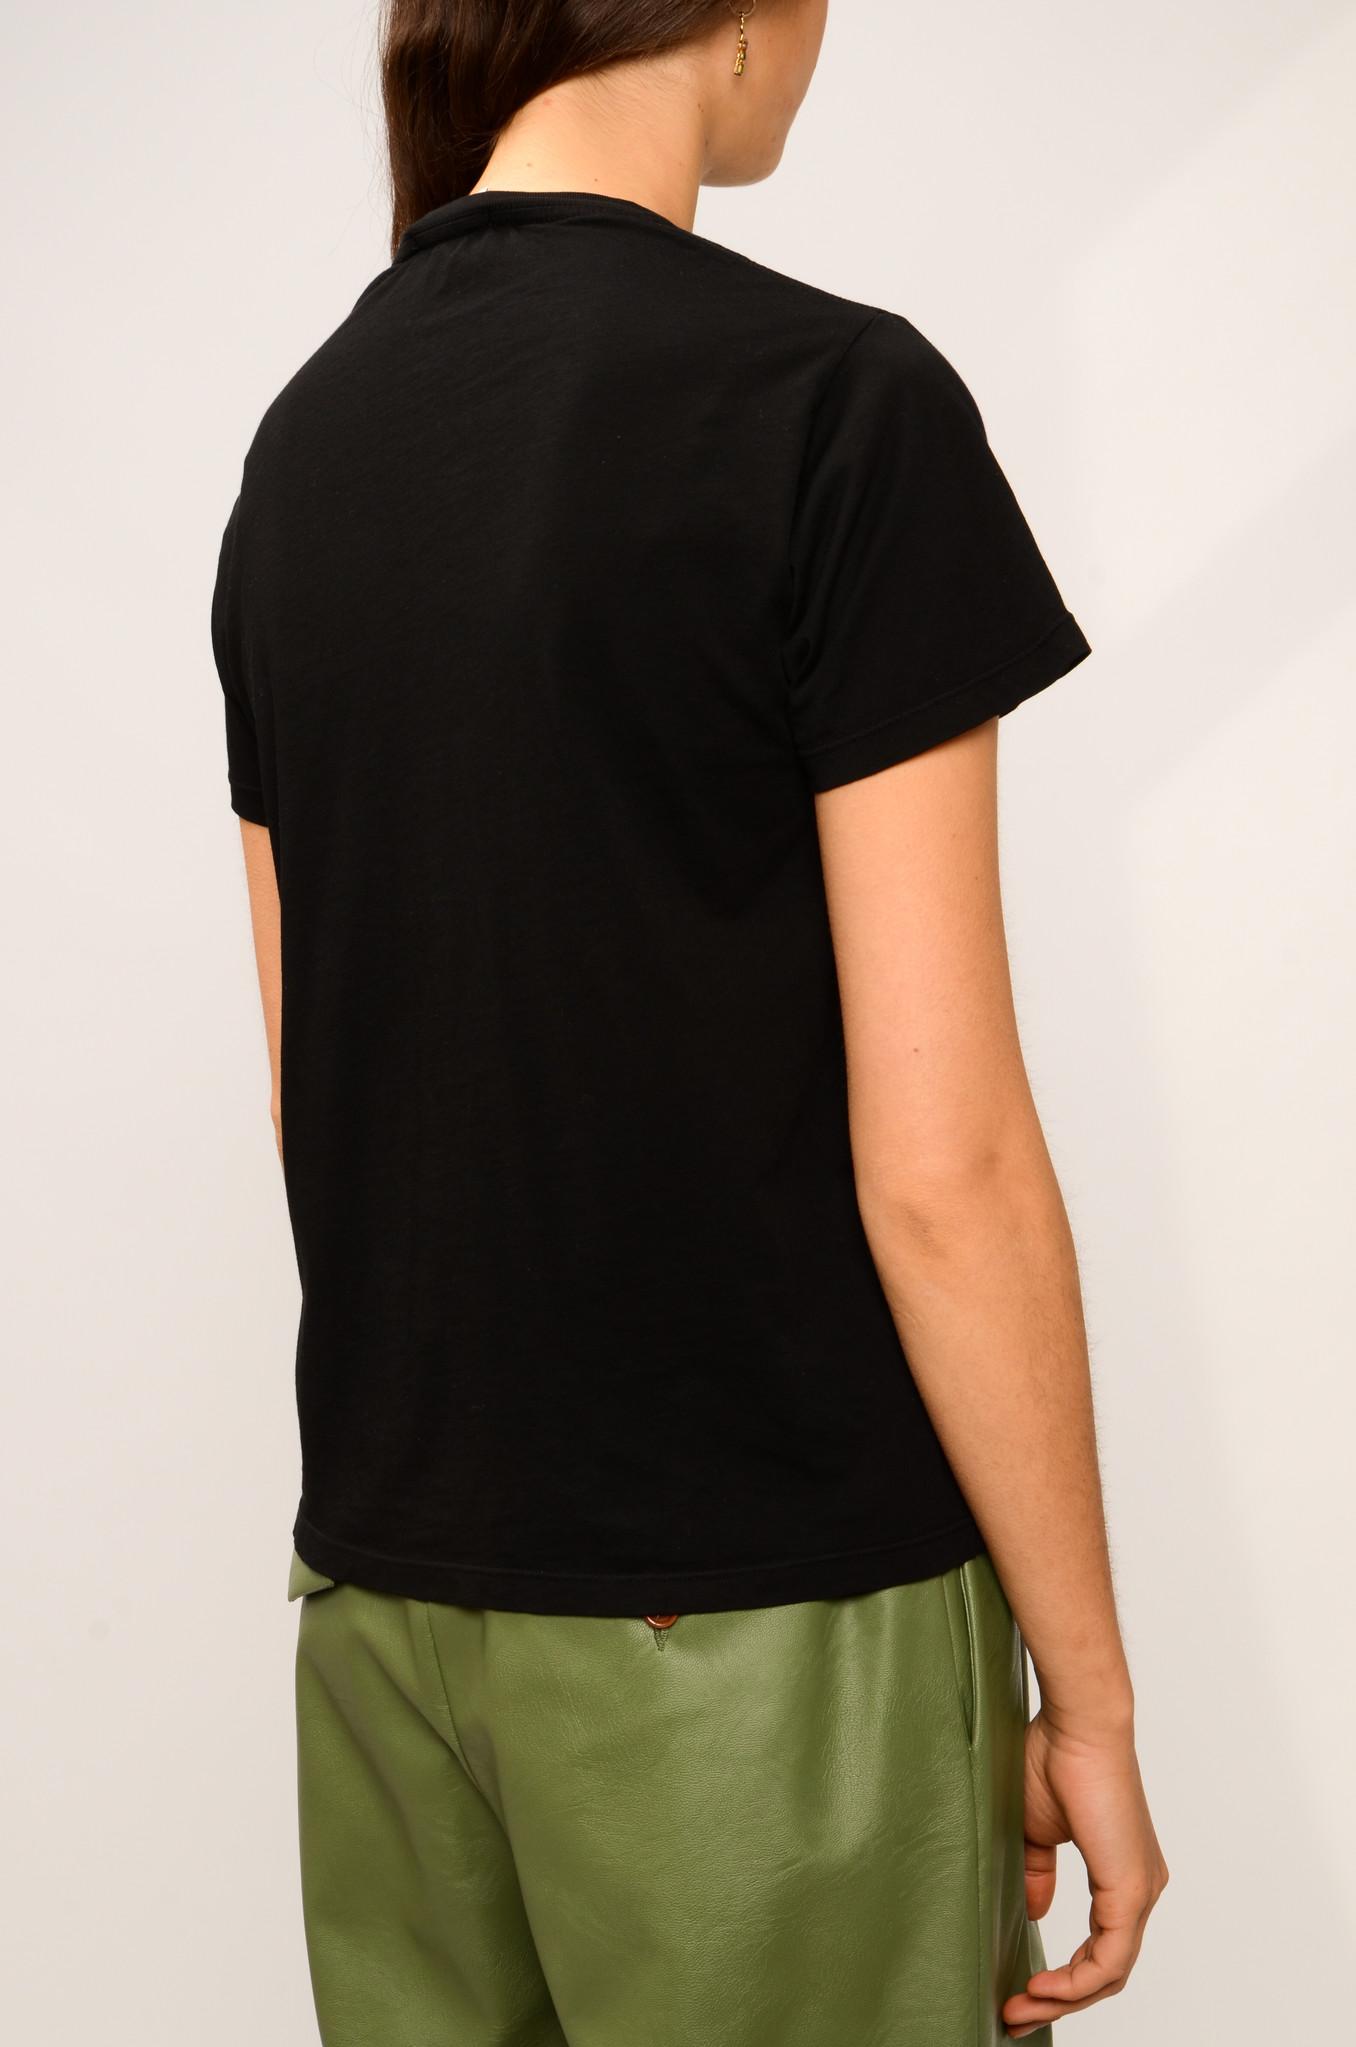 RENA T-SHIRT IN BLACK-4